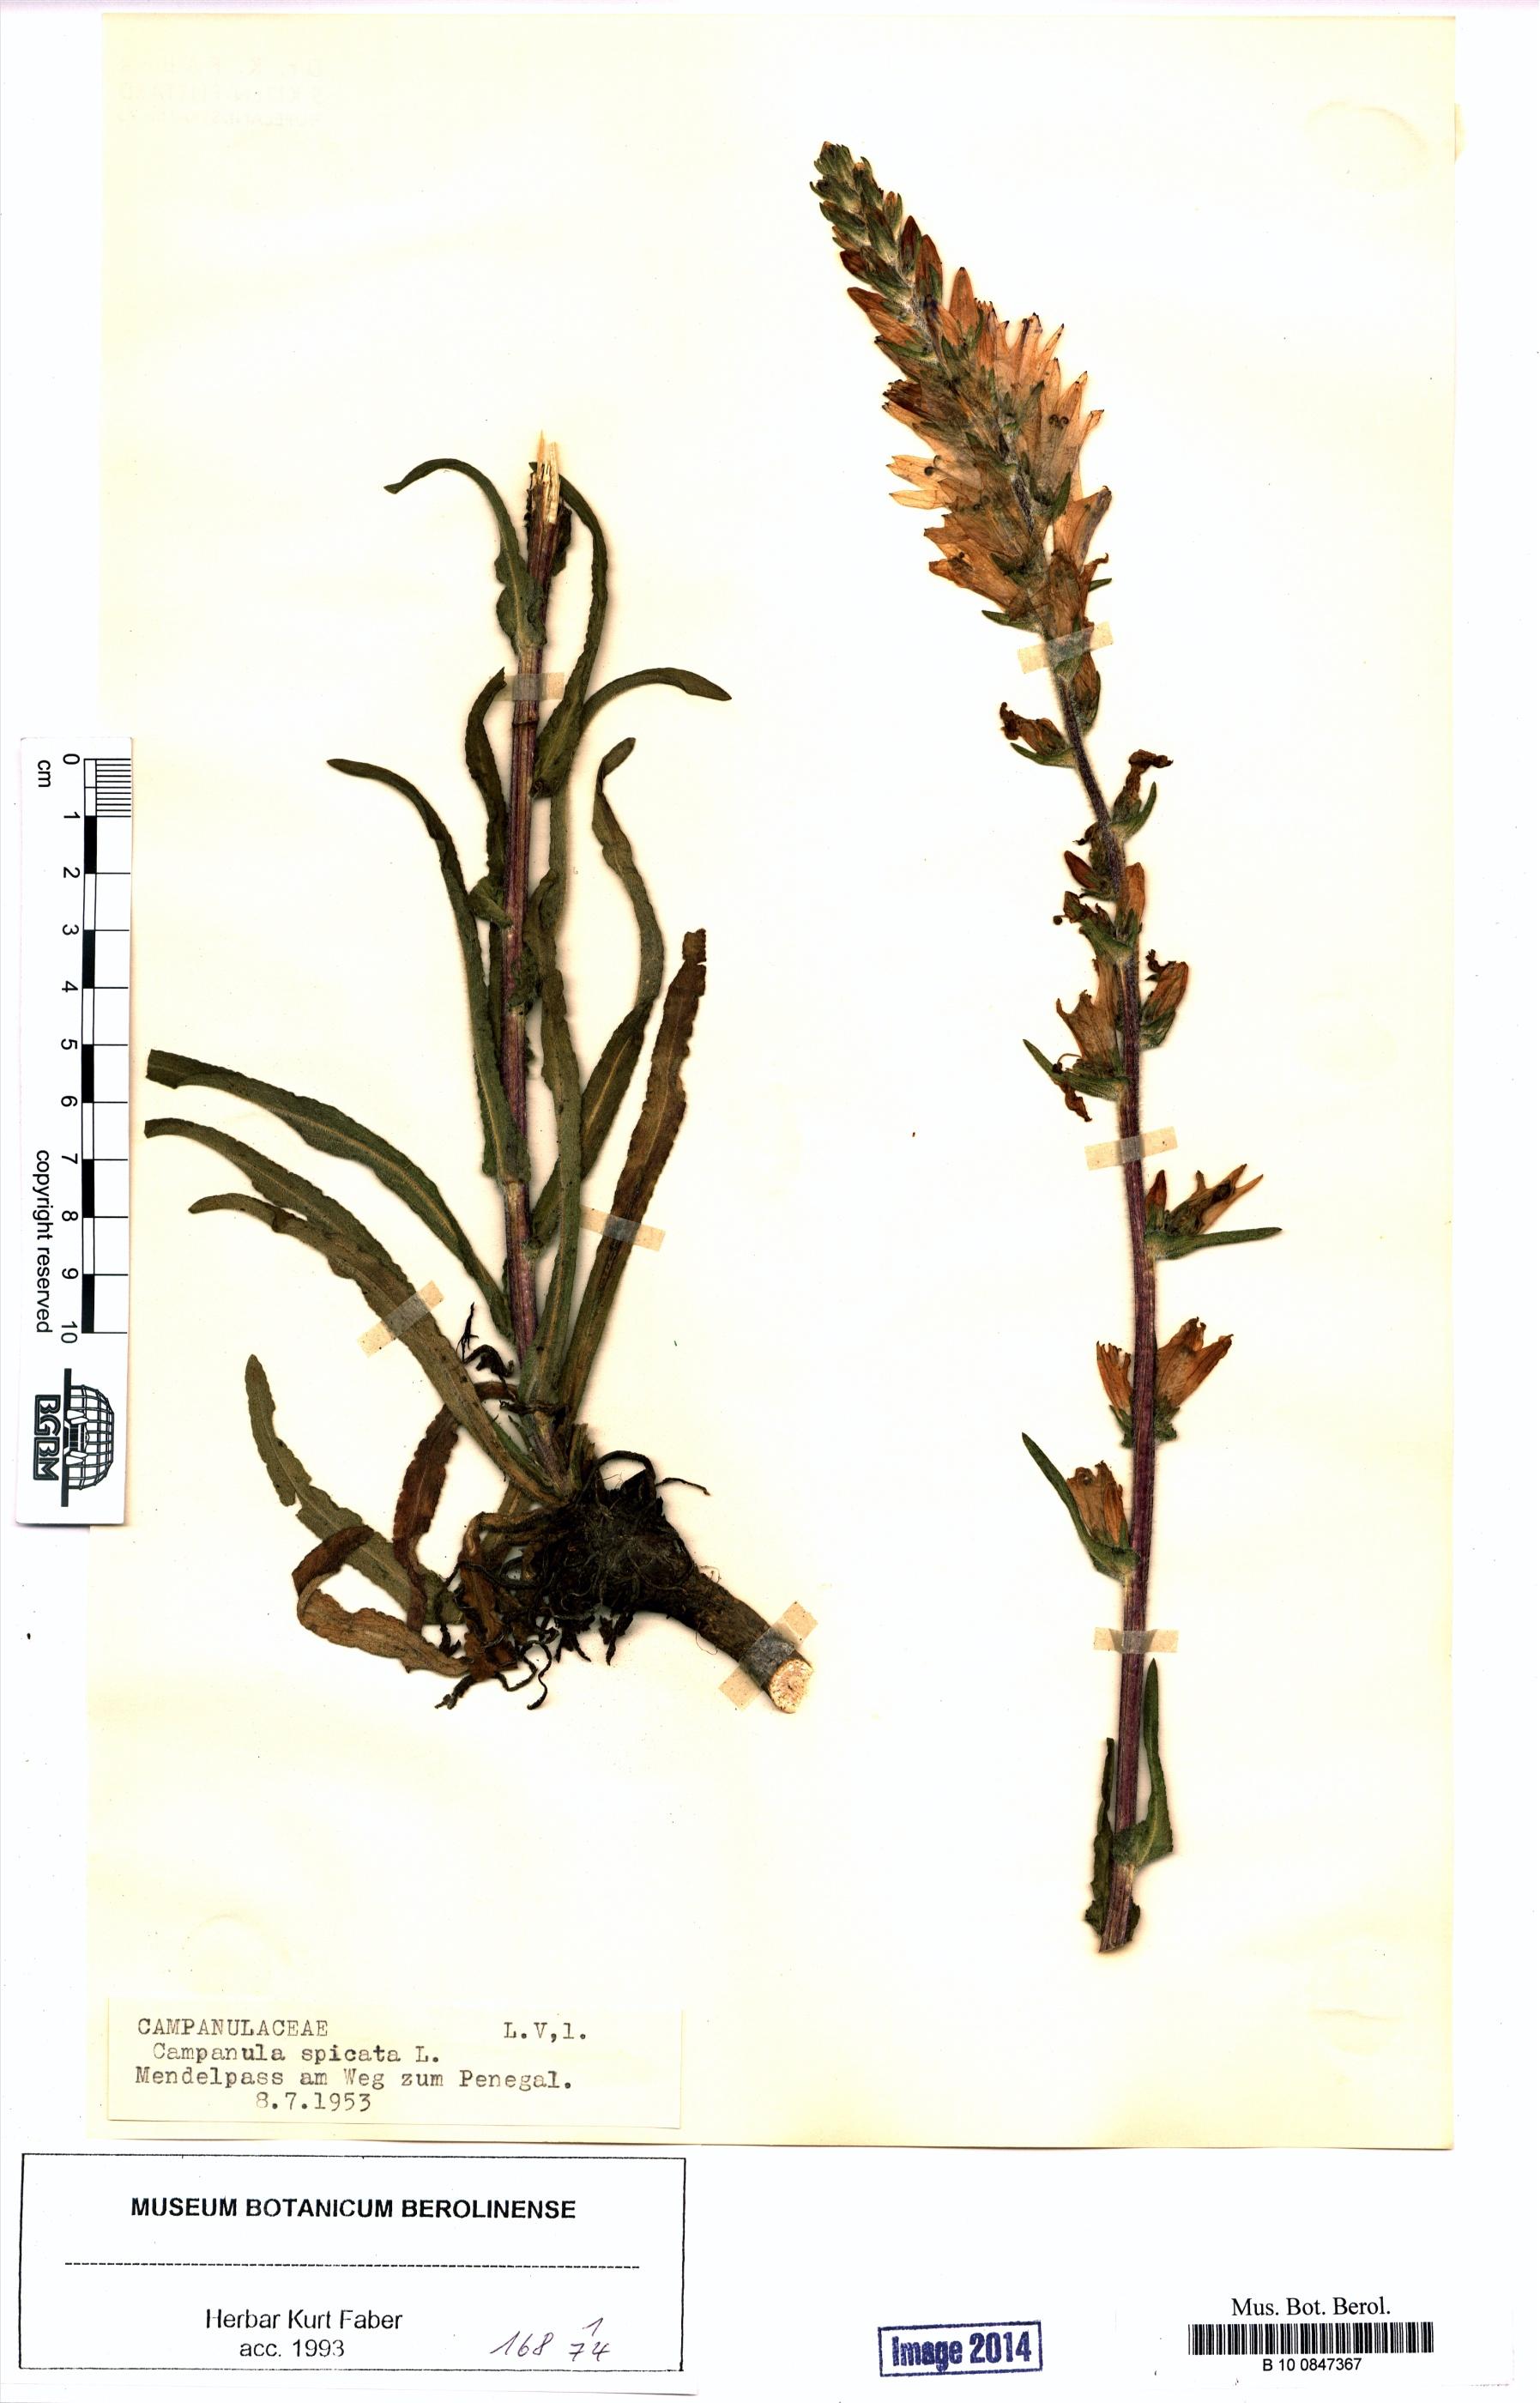 http://ww2.bgbm.org/herbarium/images/B/10/08/47/36/B_10_0847367.jpg